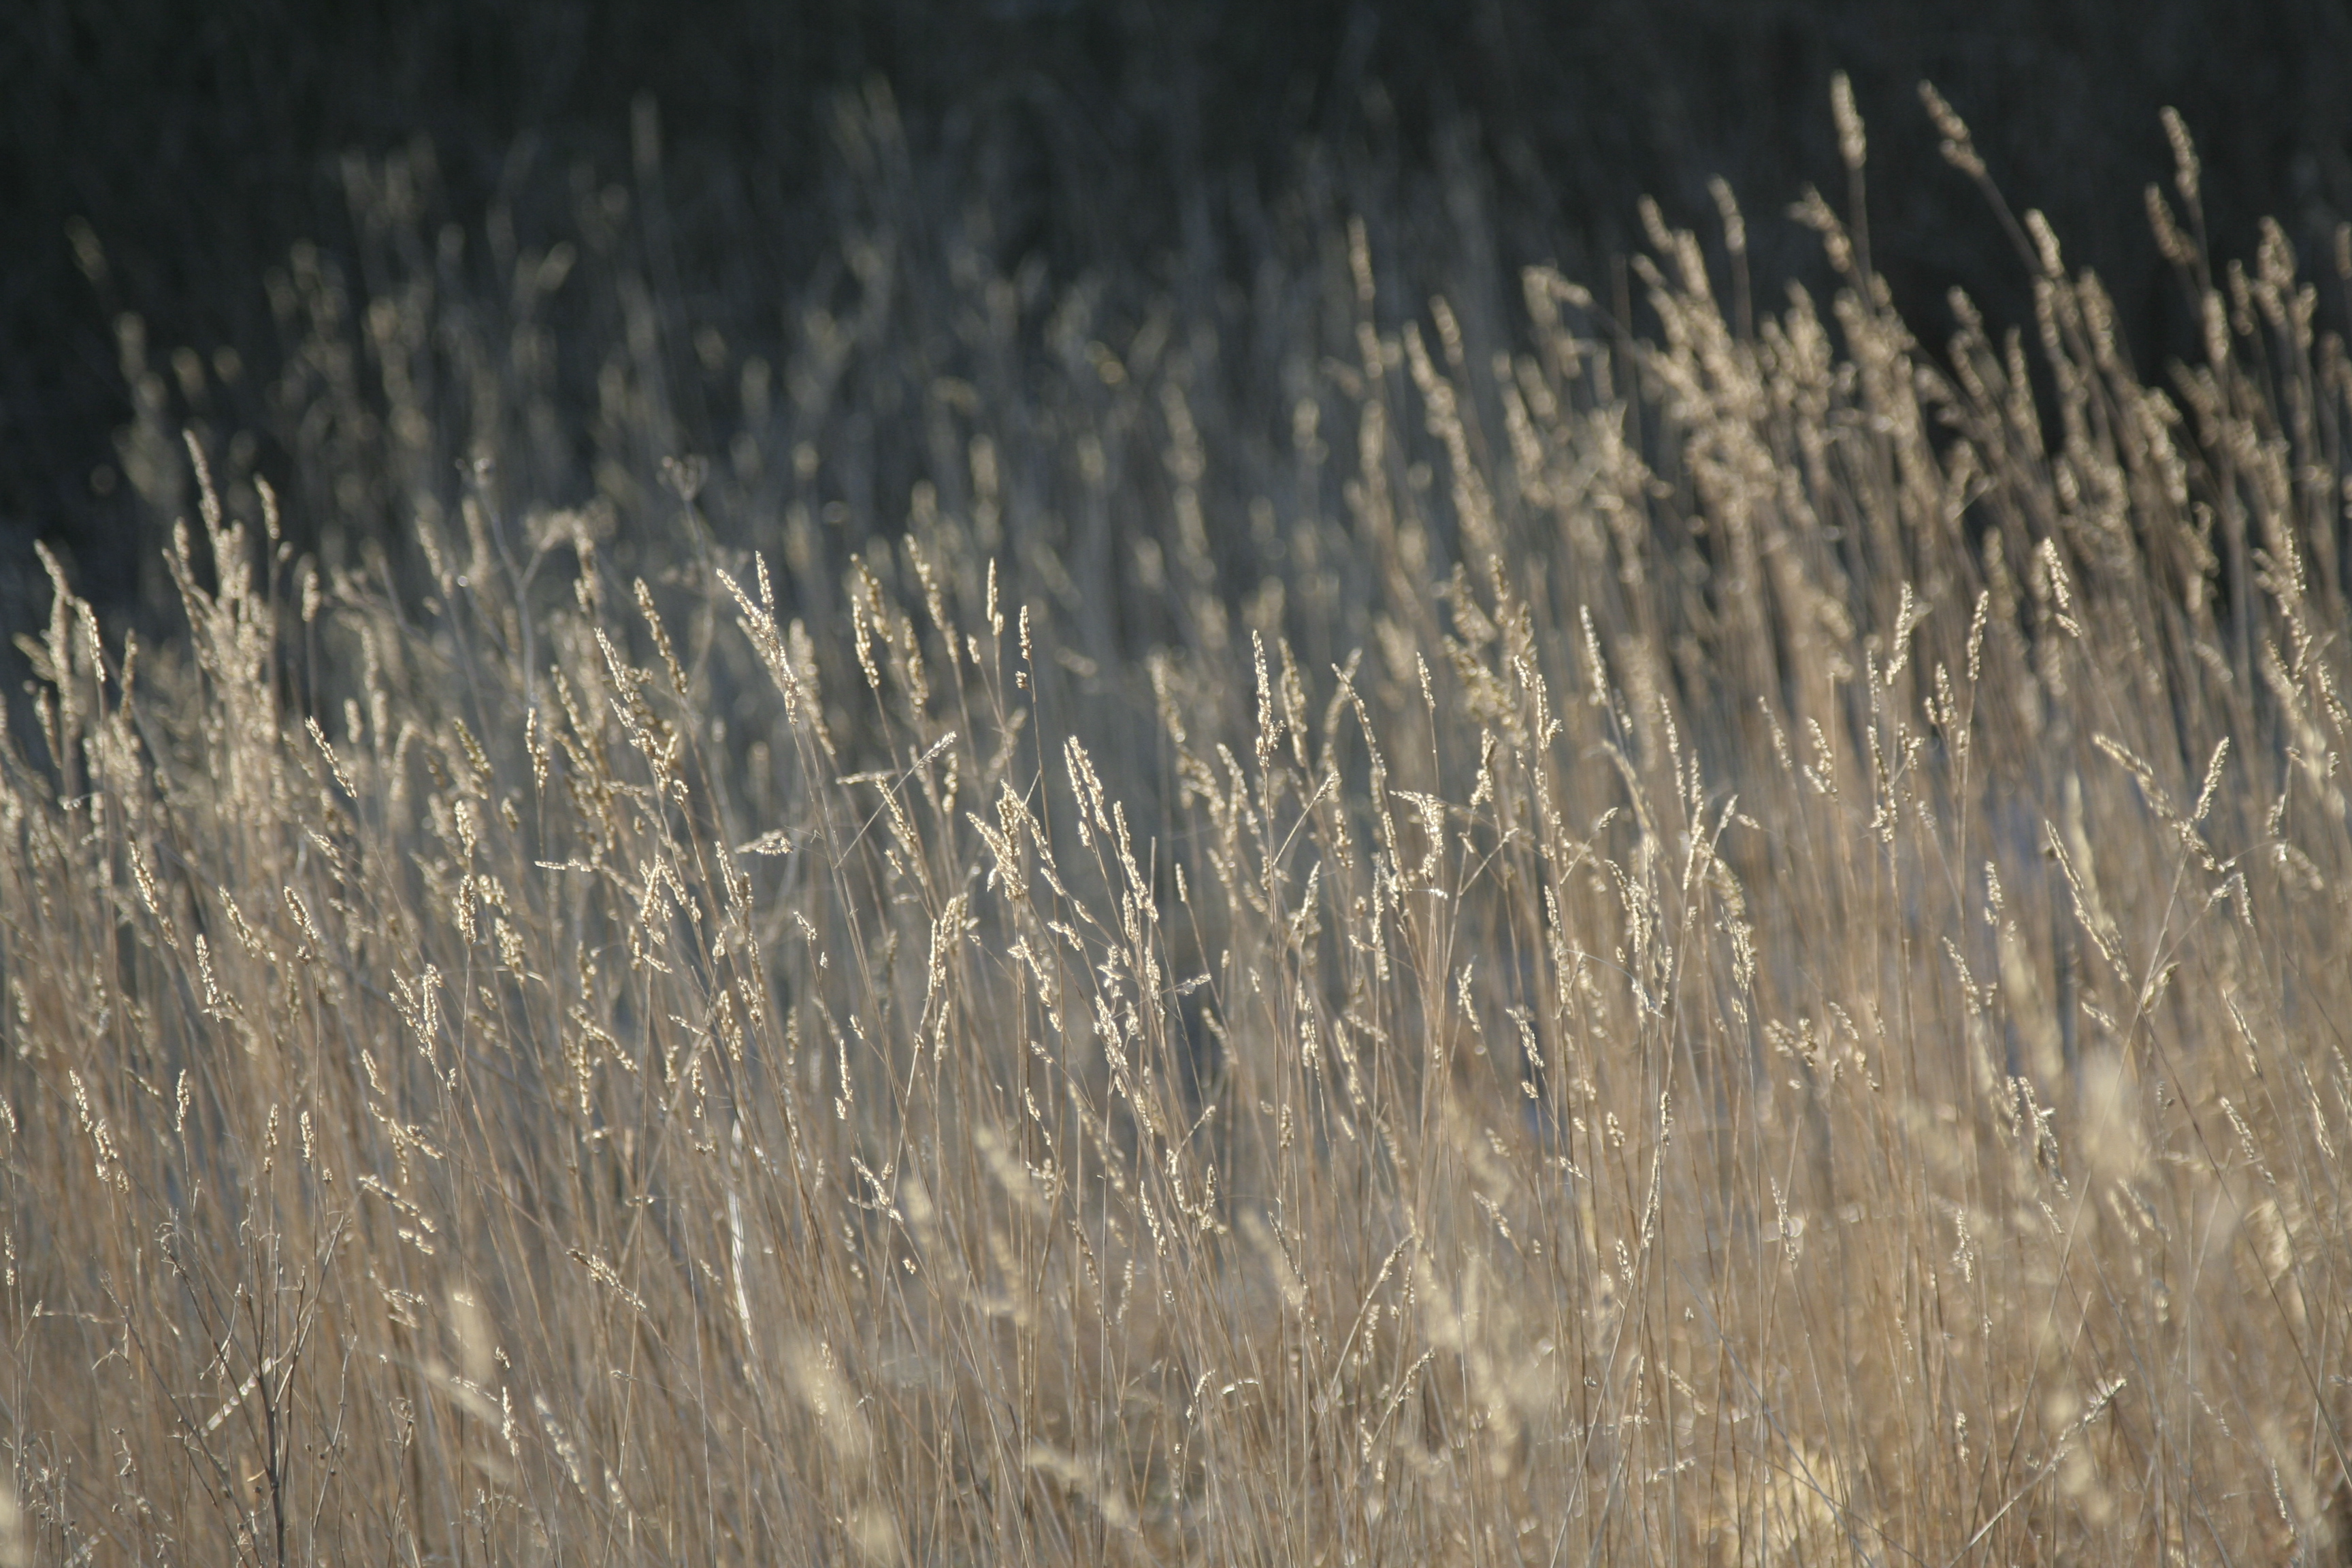 Straws, Dry, Field, Grass, Plants, HQ Photo